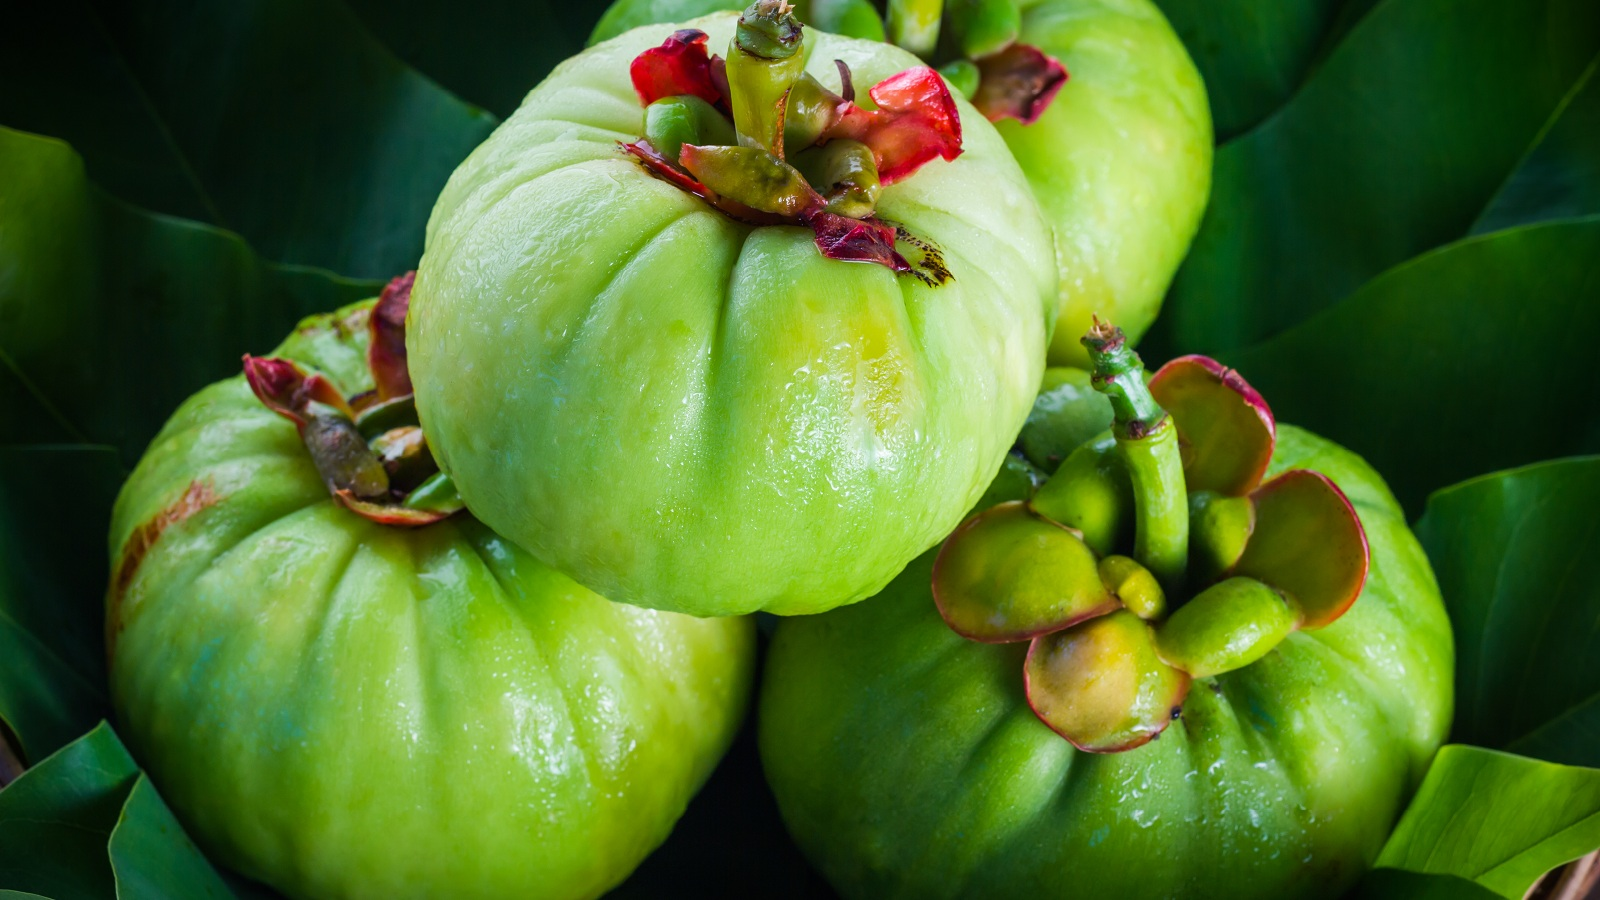 Miracle weight loss fruit garcinia cambogia